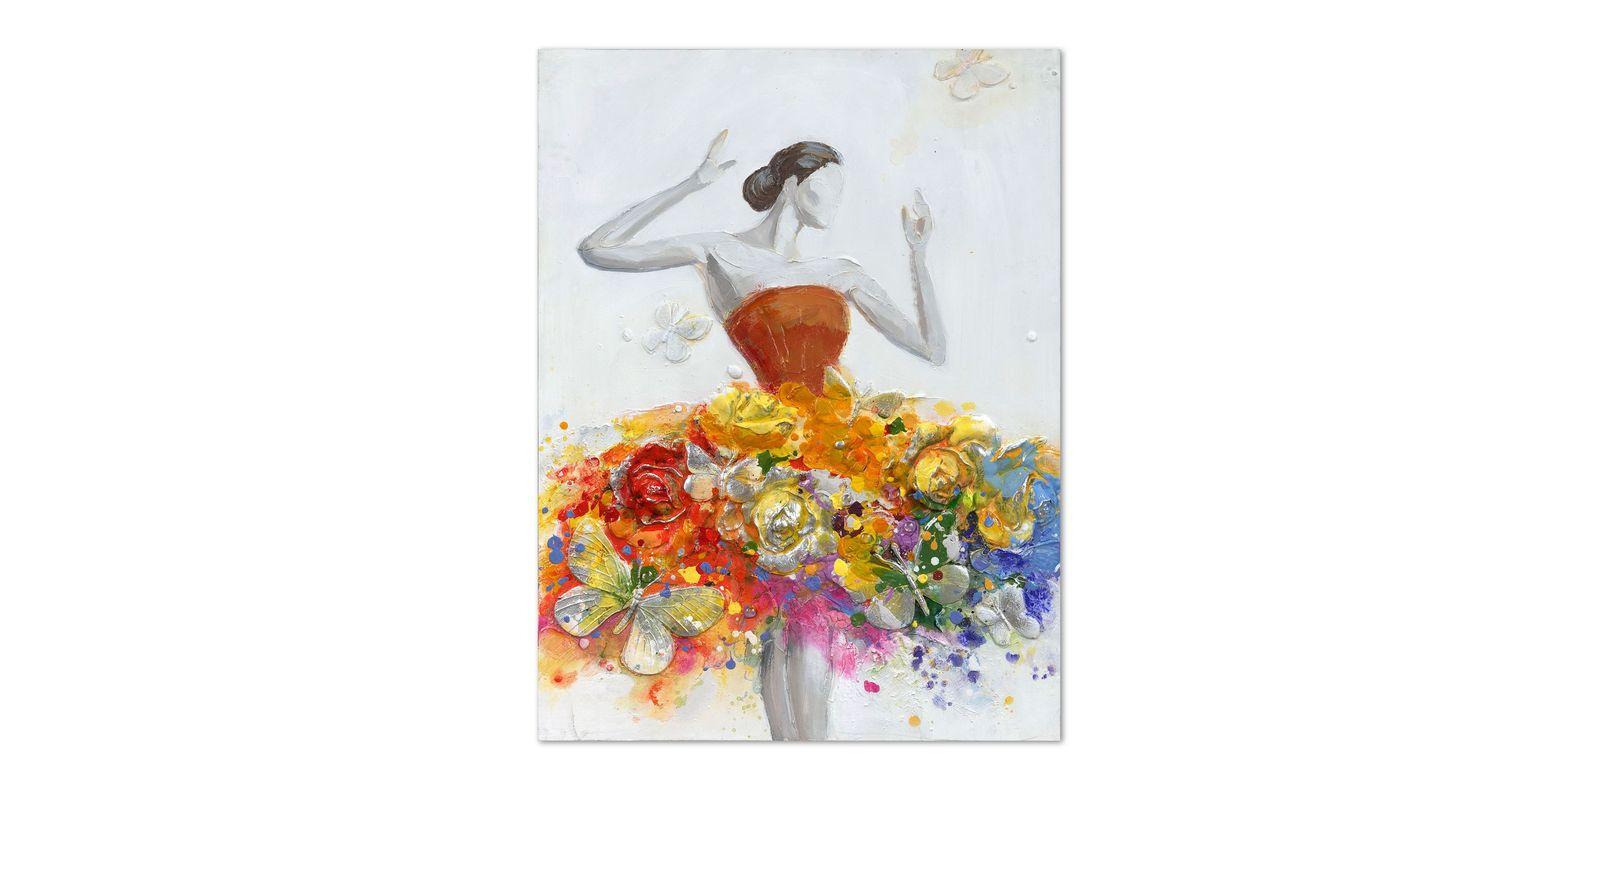 Wandbild Butterfly mit fantasievollem Motiv